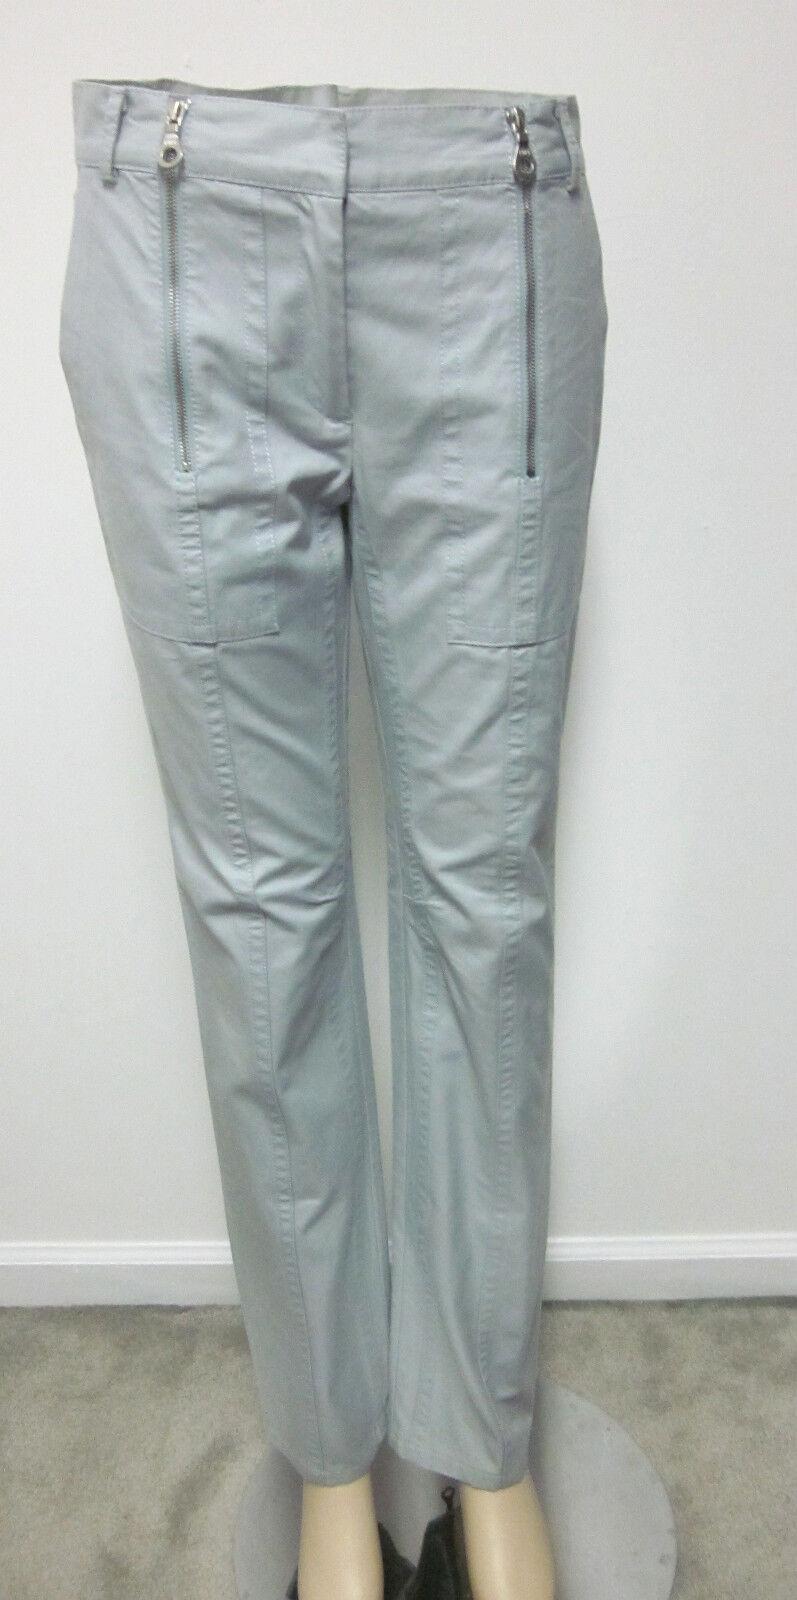 MARC JACOBS COLLECTION Pants Trousers Pale bluee Cotton Zippers 4  585 MINT